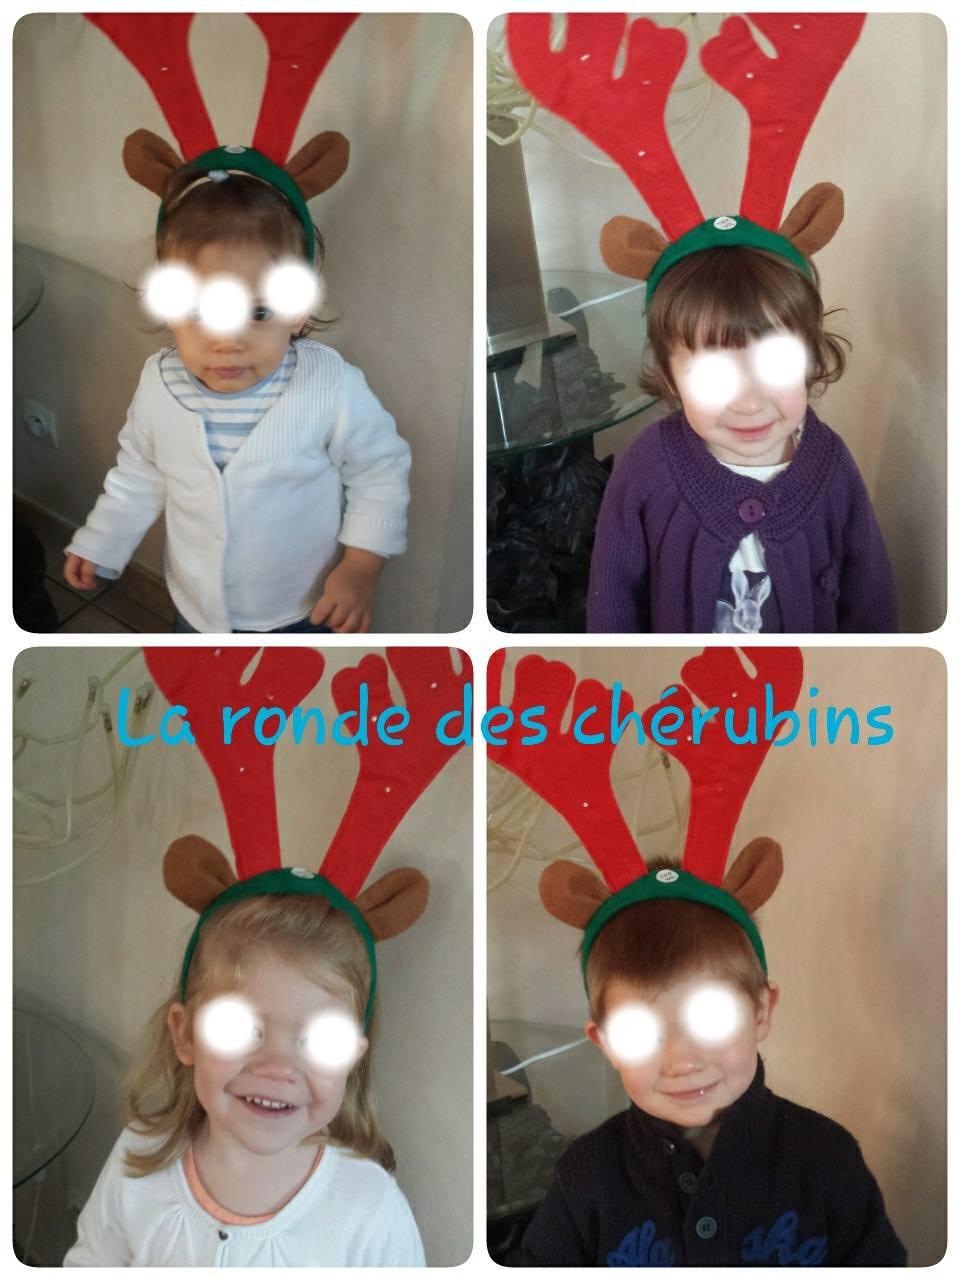 la ronde des chérubins: les petits rennes